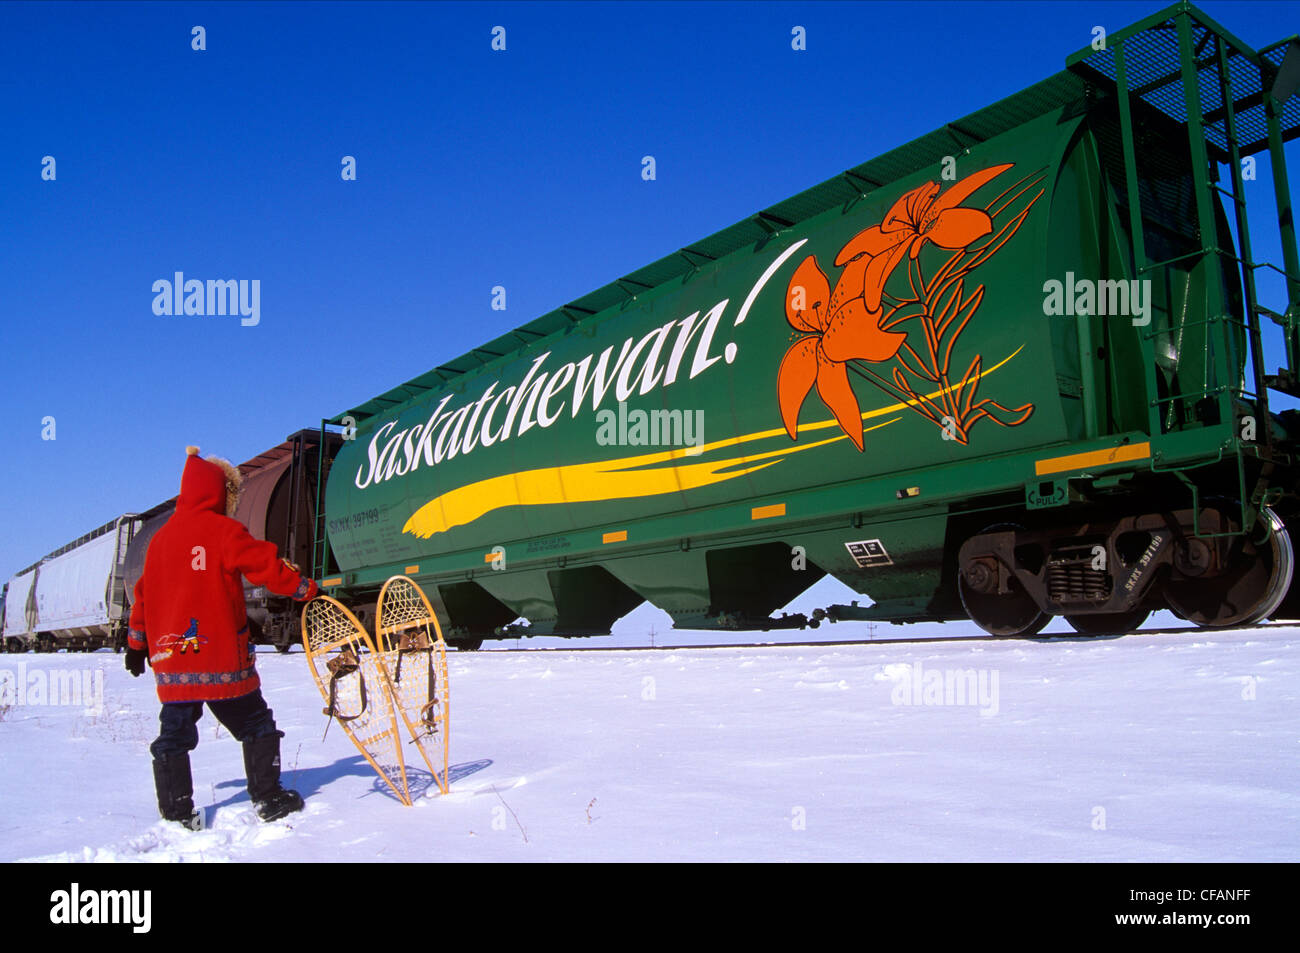 Rail Car Stock Photos & Rail Car Stock Images - Alamy